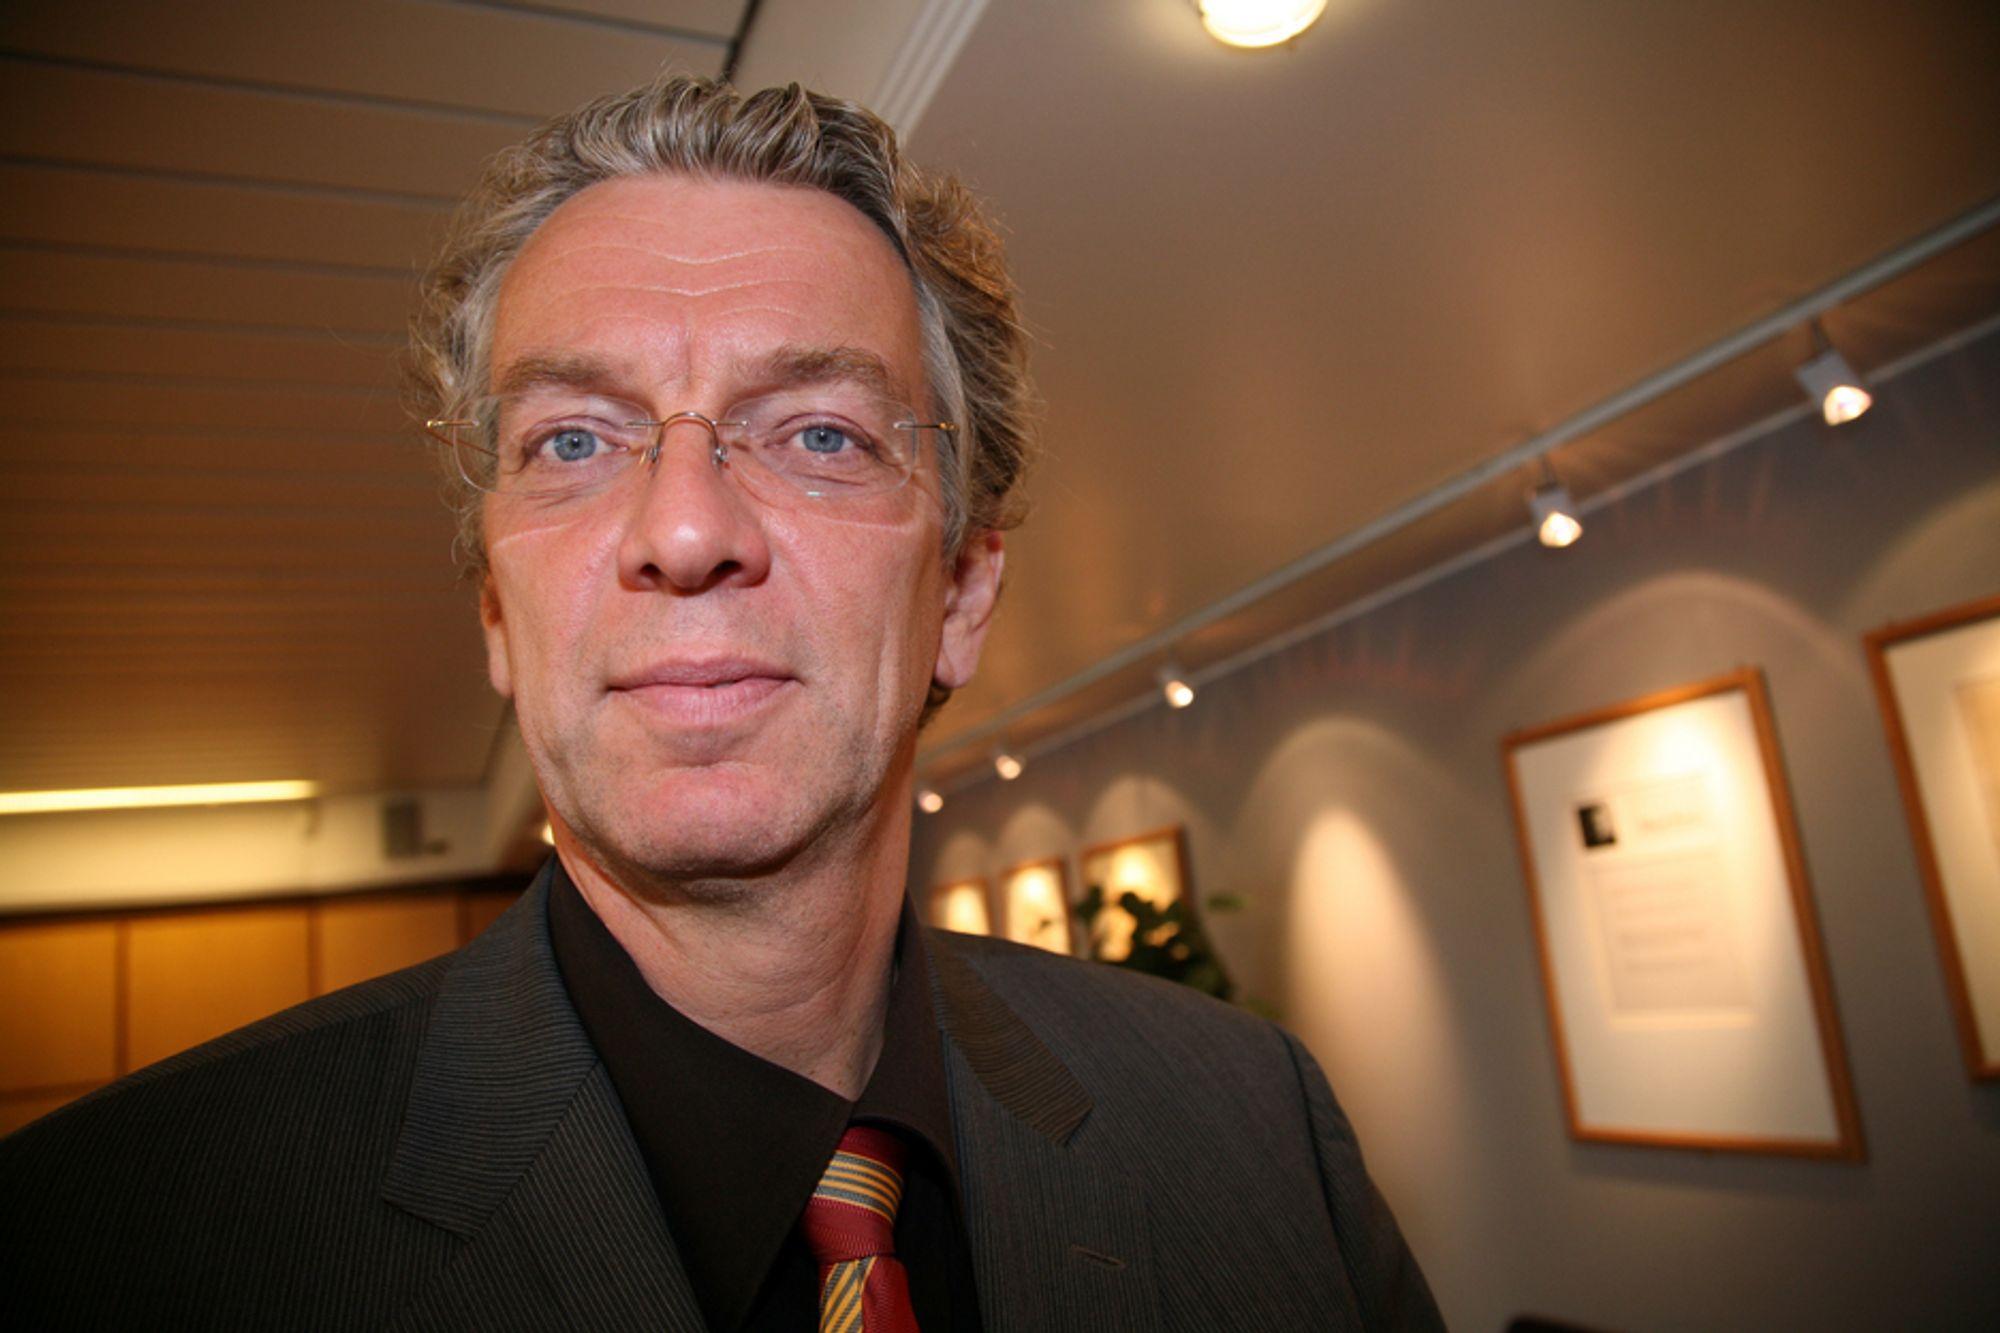 NY JOBB: Econ-direktør Auke Lont, blir ny konserndirektør i Statnett.